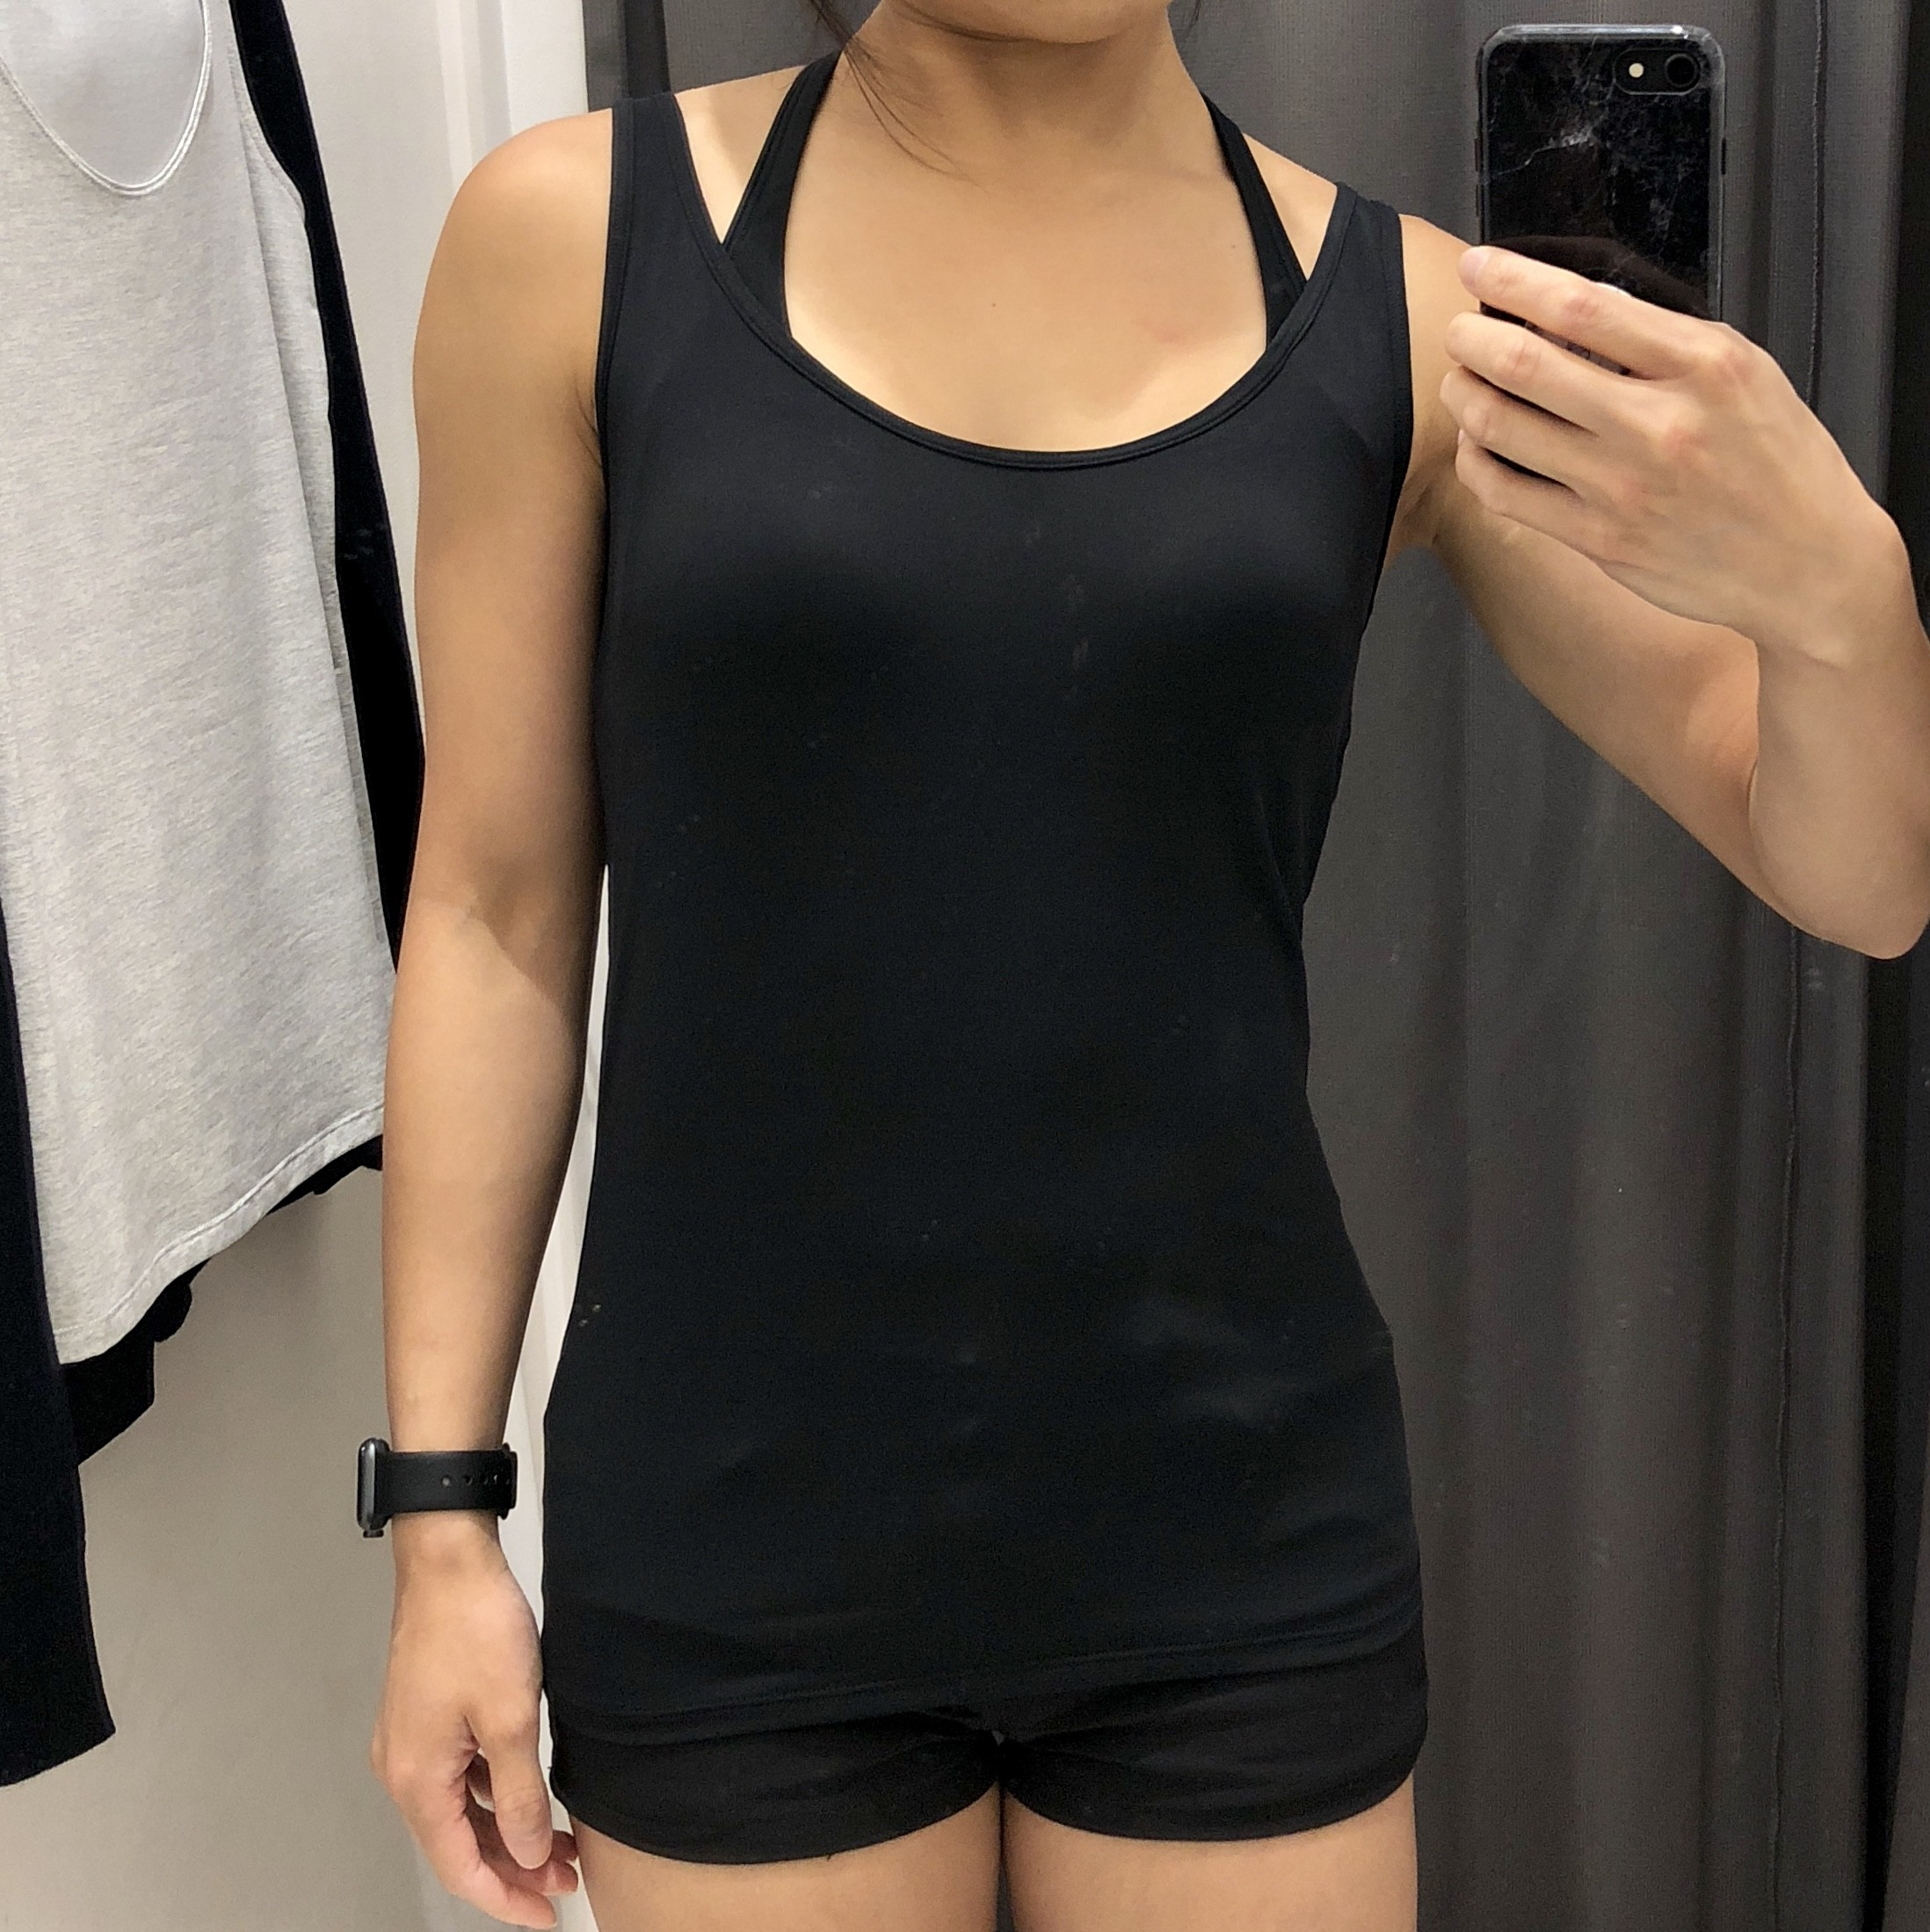 Uniqlo sleeveless top black color in size S